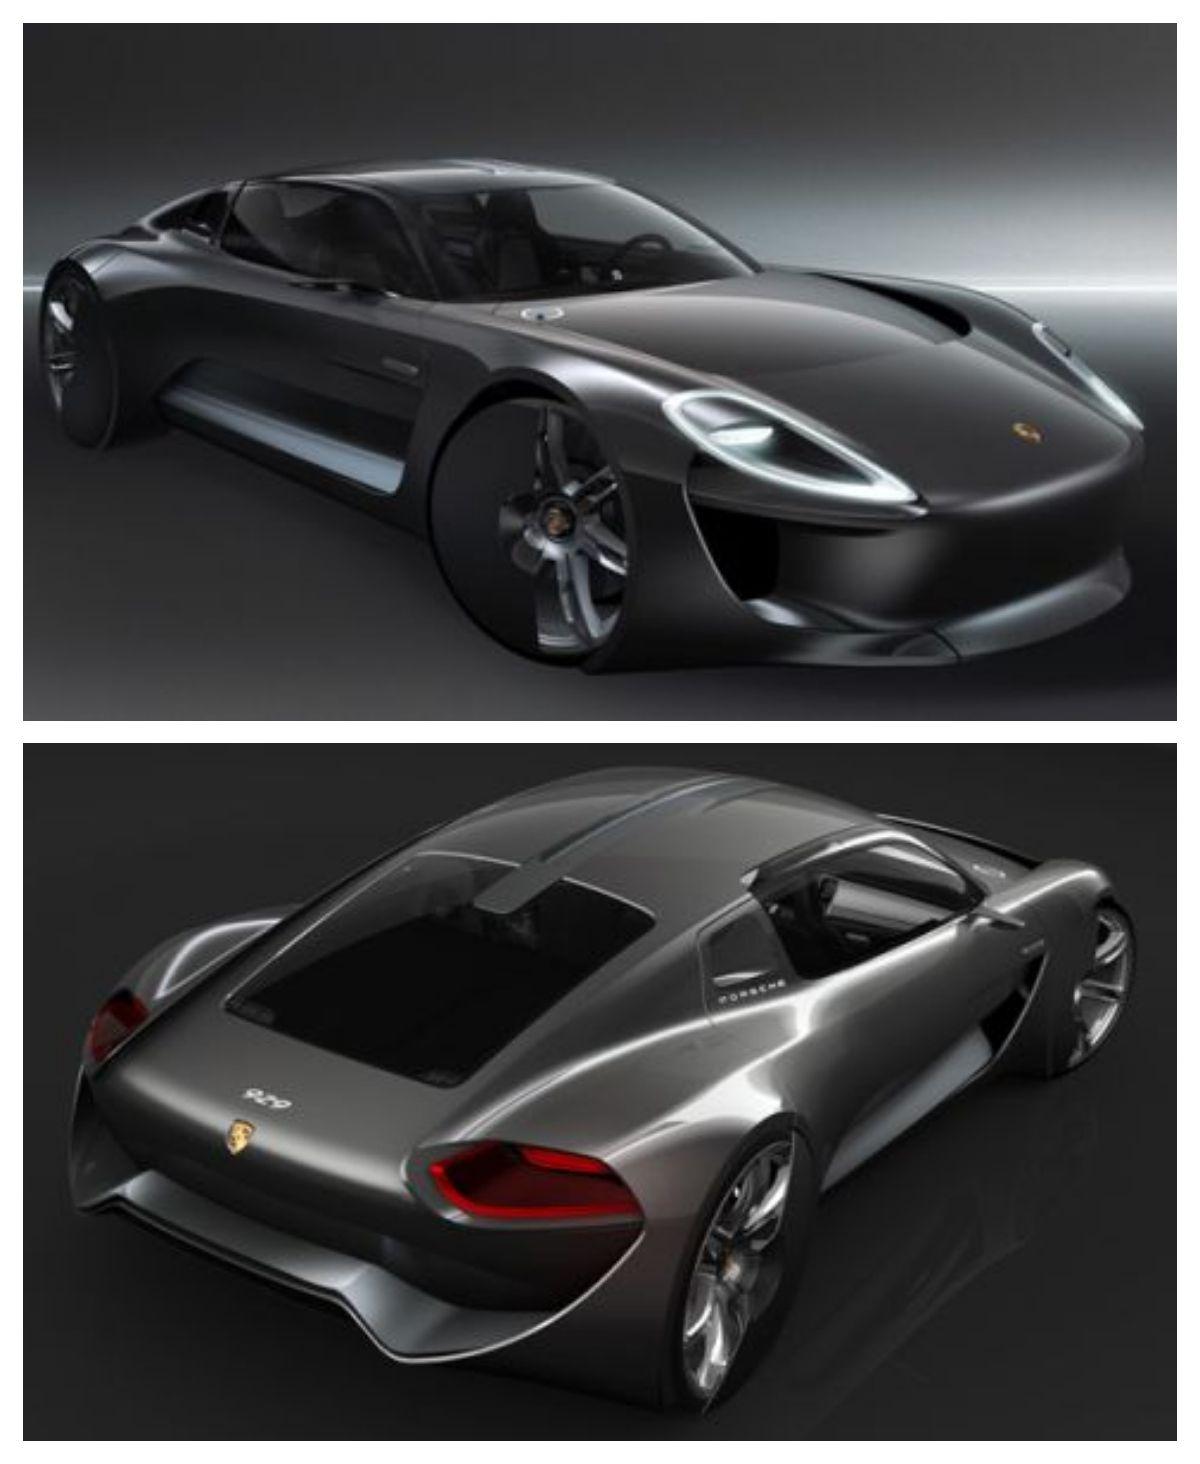 Porsche 929 Electric 4 Seater Sports Toure Super Cars Futuristic Cars Concept Porsche